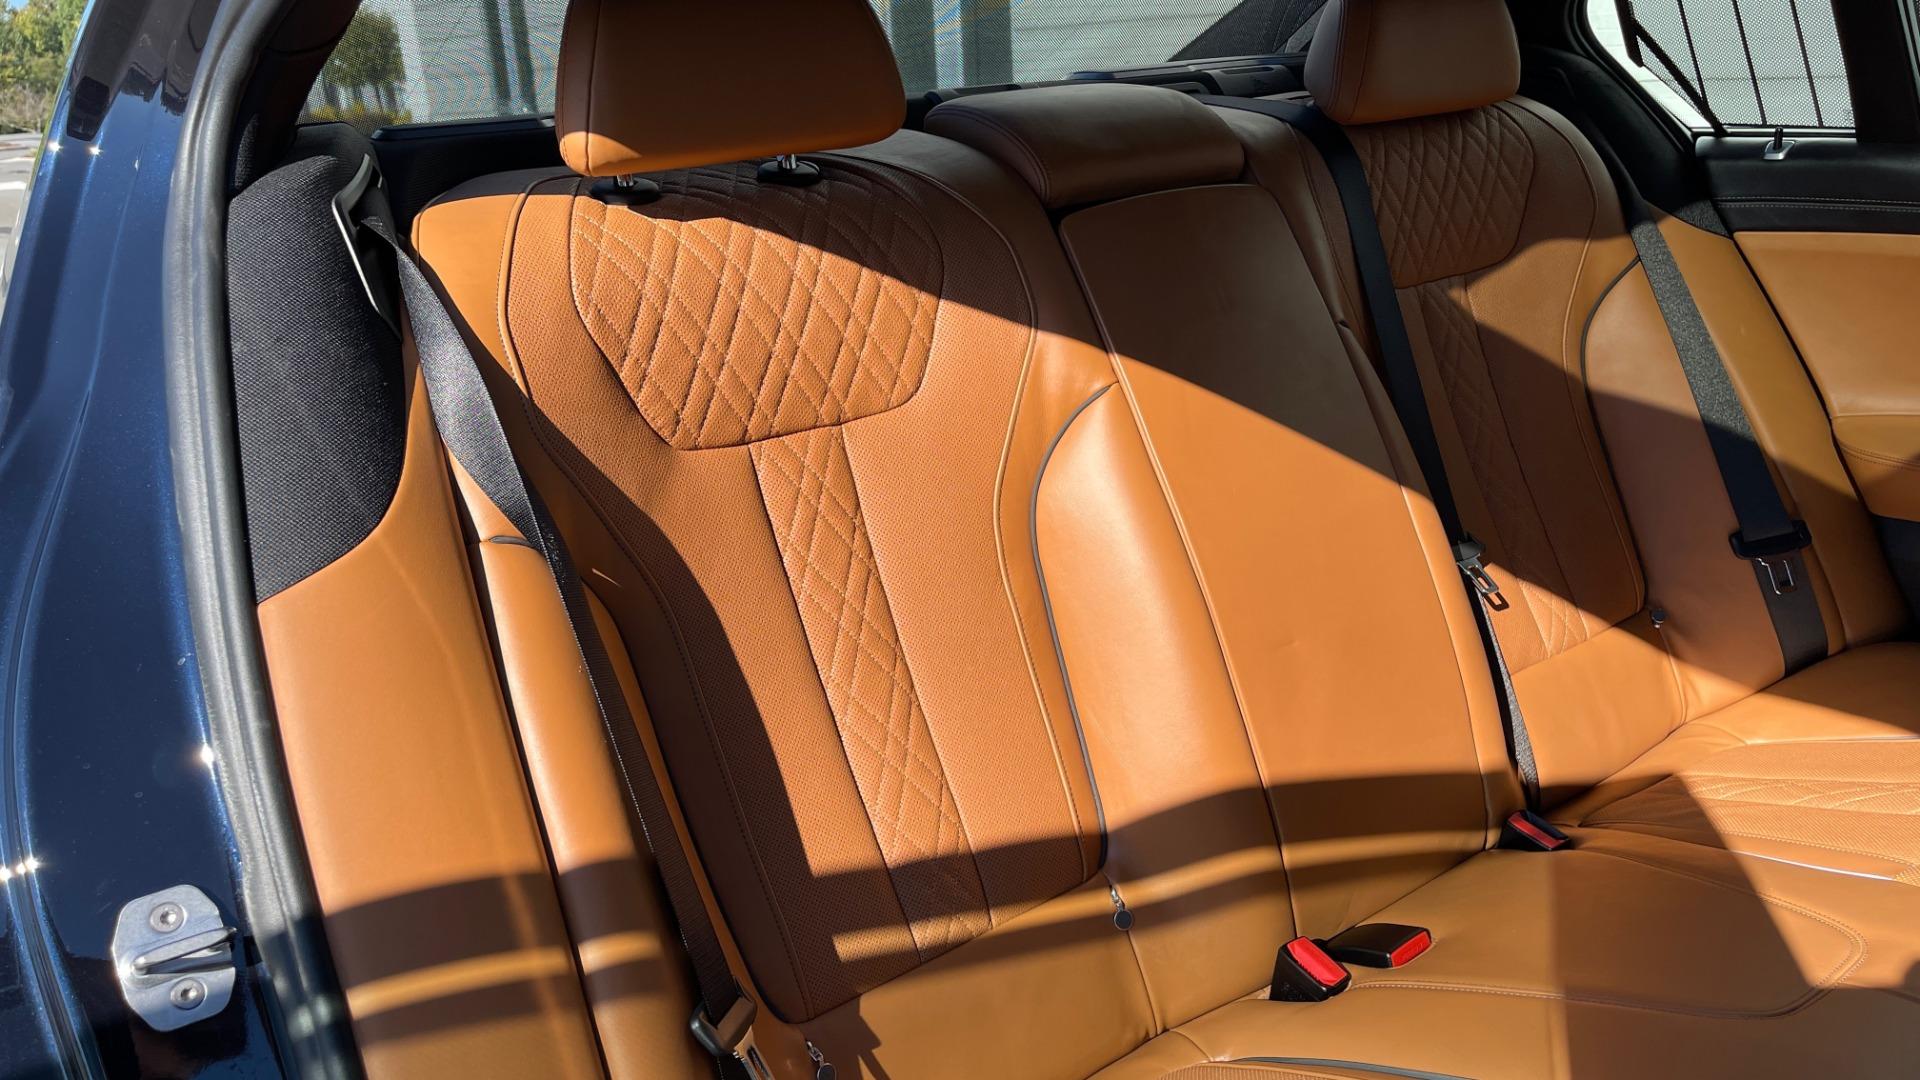 Used 2019 BMW 7 SERIES 750I XDRIVE M-SPORT / EXEC PKG / DRVR ASST PLUS / CLD WTHR / PAR for sale $60,995 at Formula Imports in Charlotte NC 28227 52